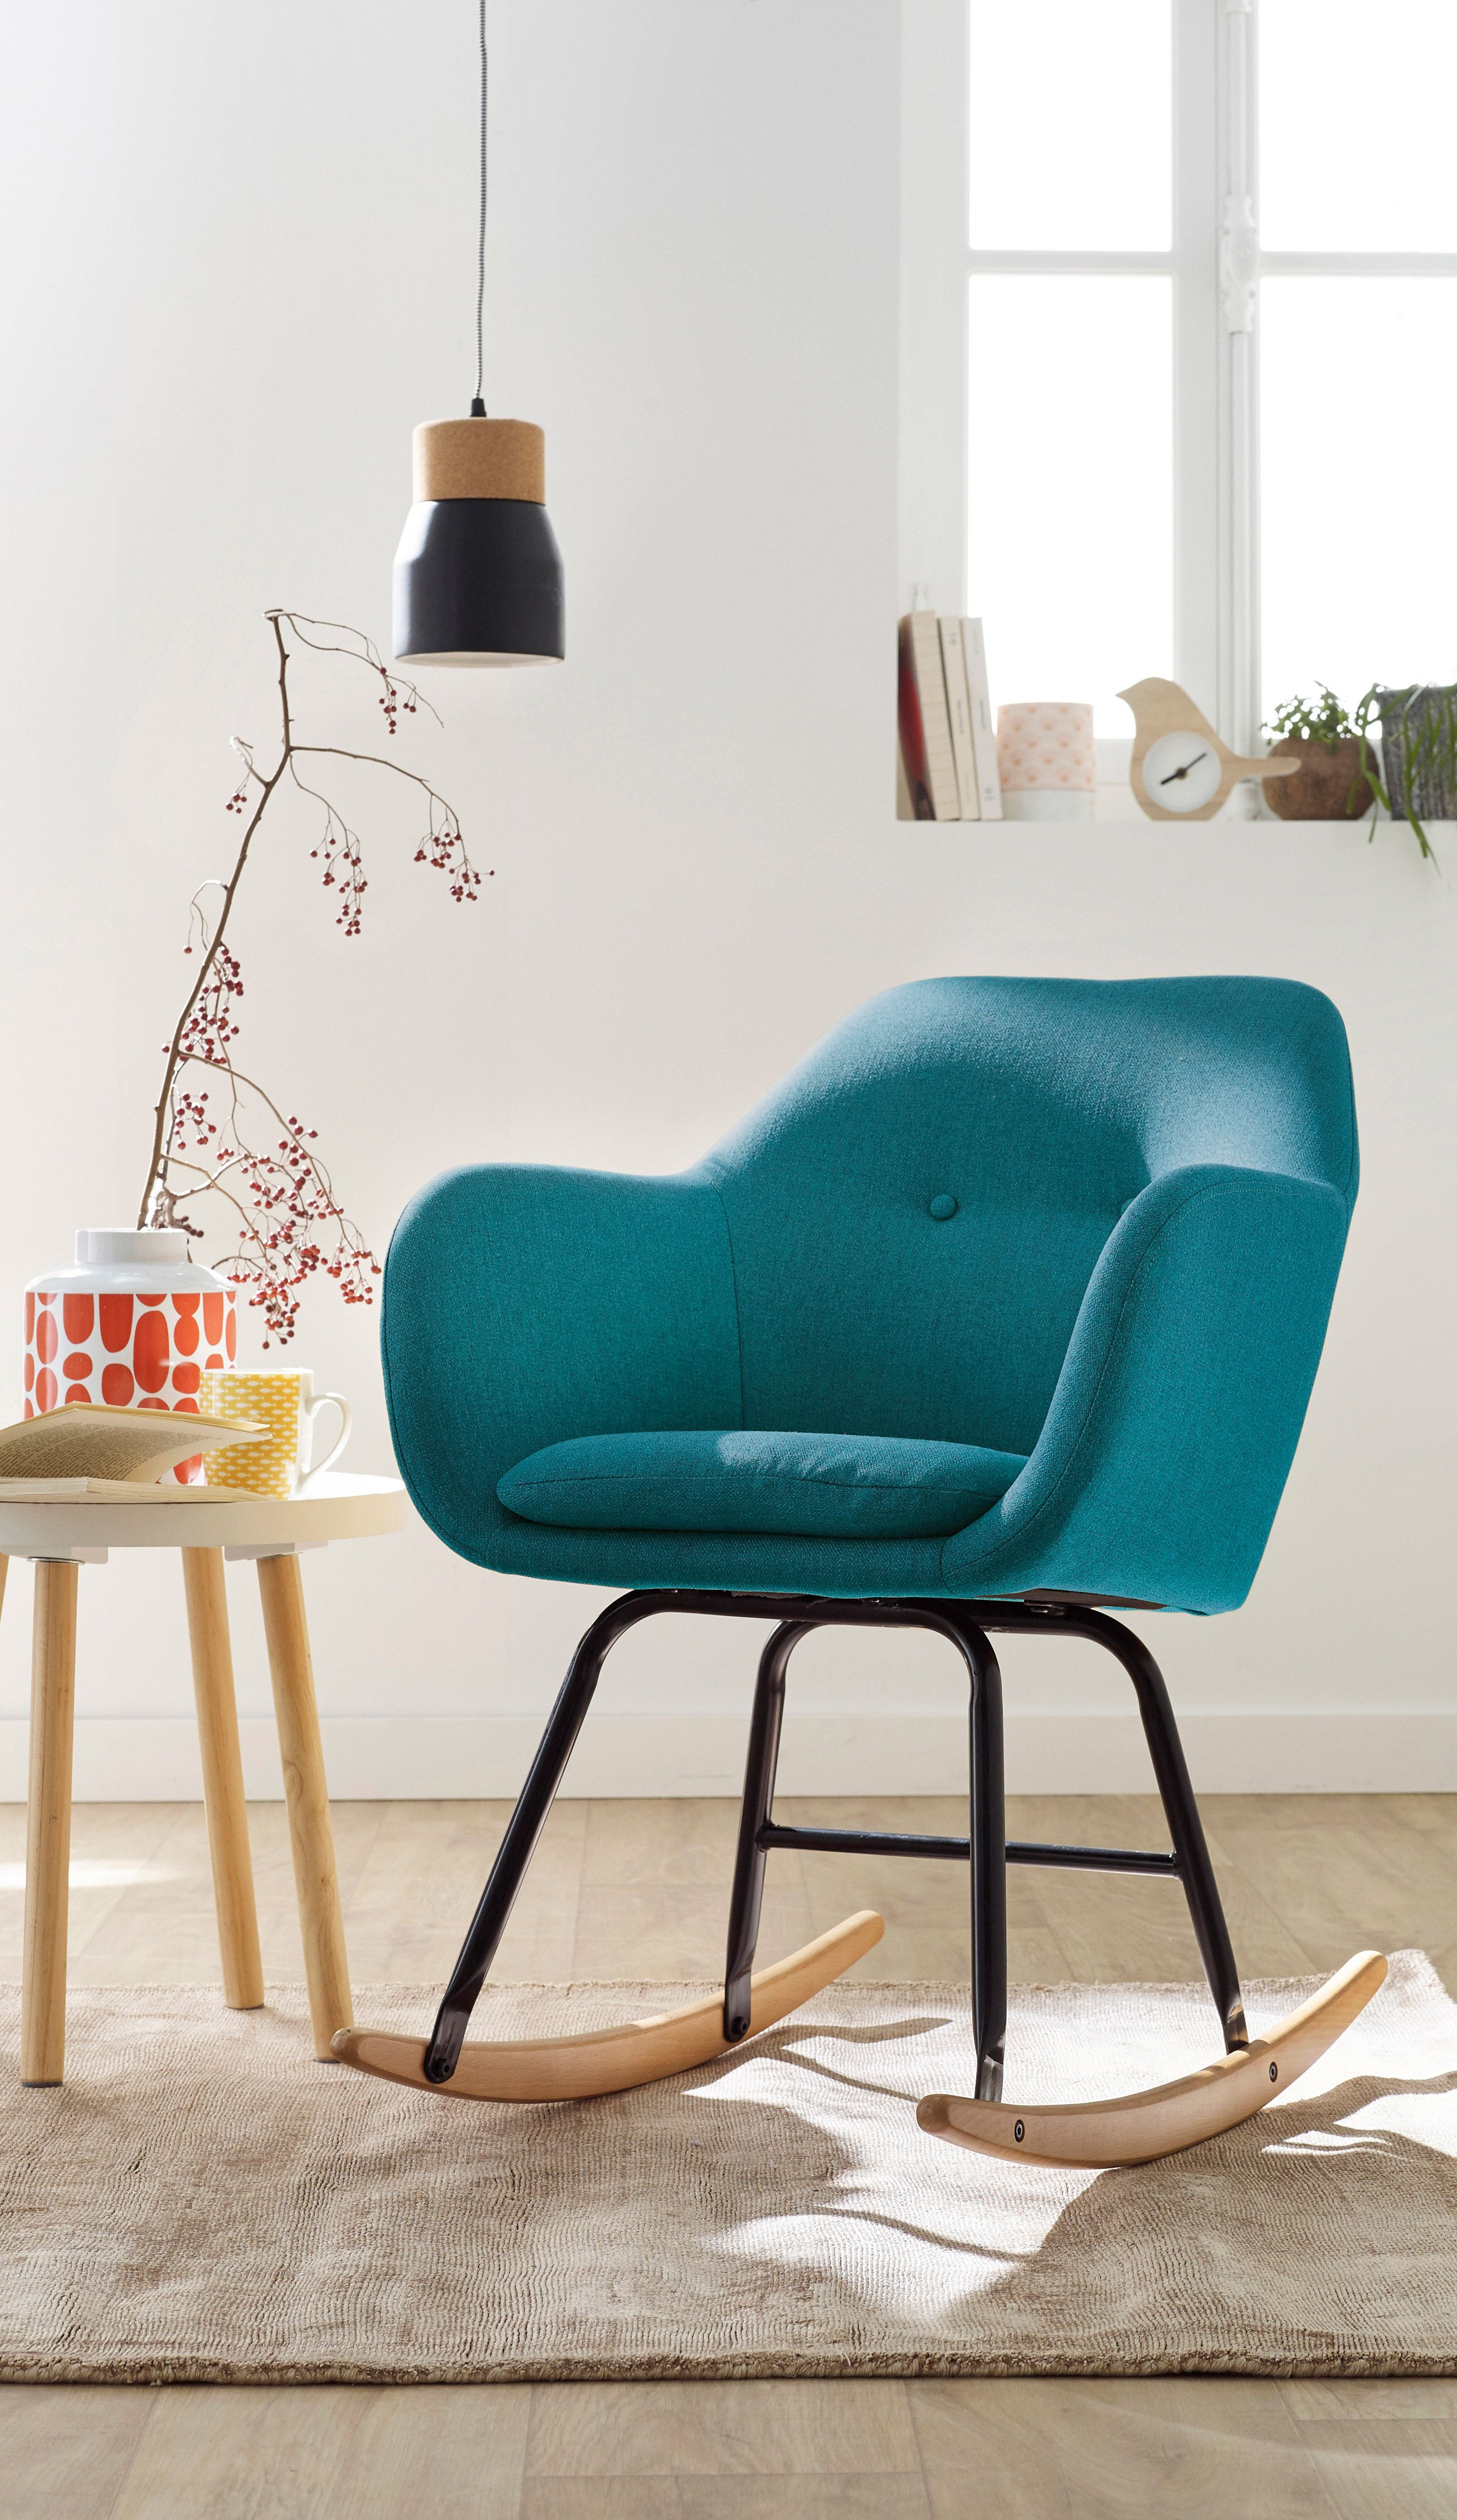 emilia salon fauteuil bascule en tissu bleu p trole tissu bleu bleu p trole et bascule. Black Bedroom Furniture Sets. Home Design Ideas